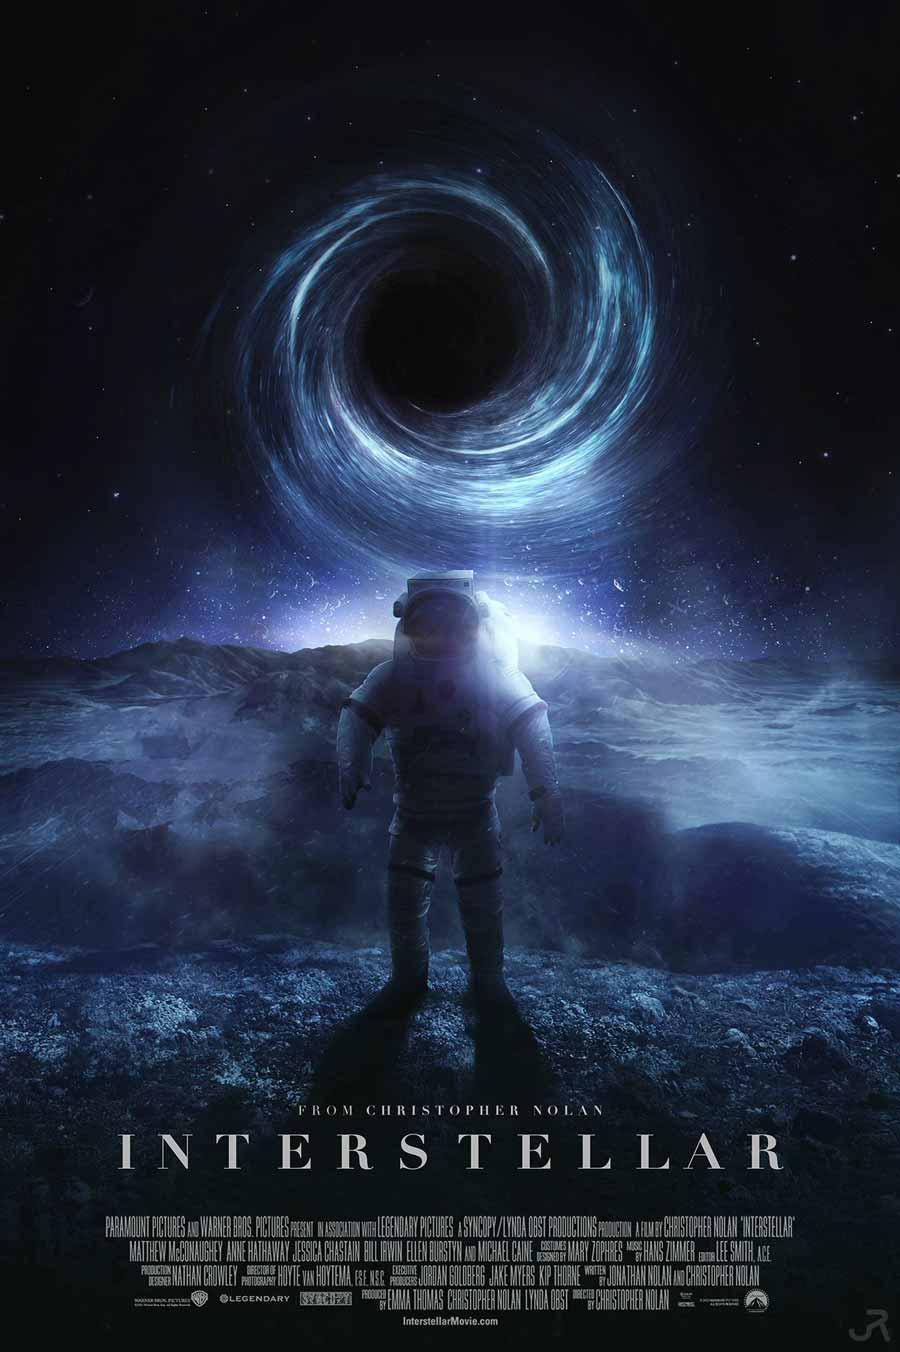 Poster for Interstellar